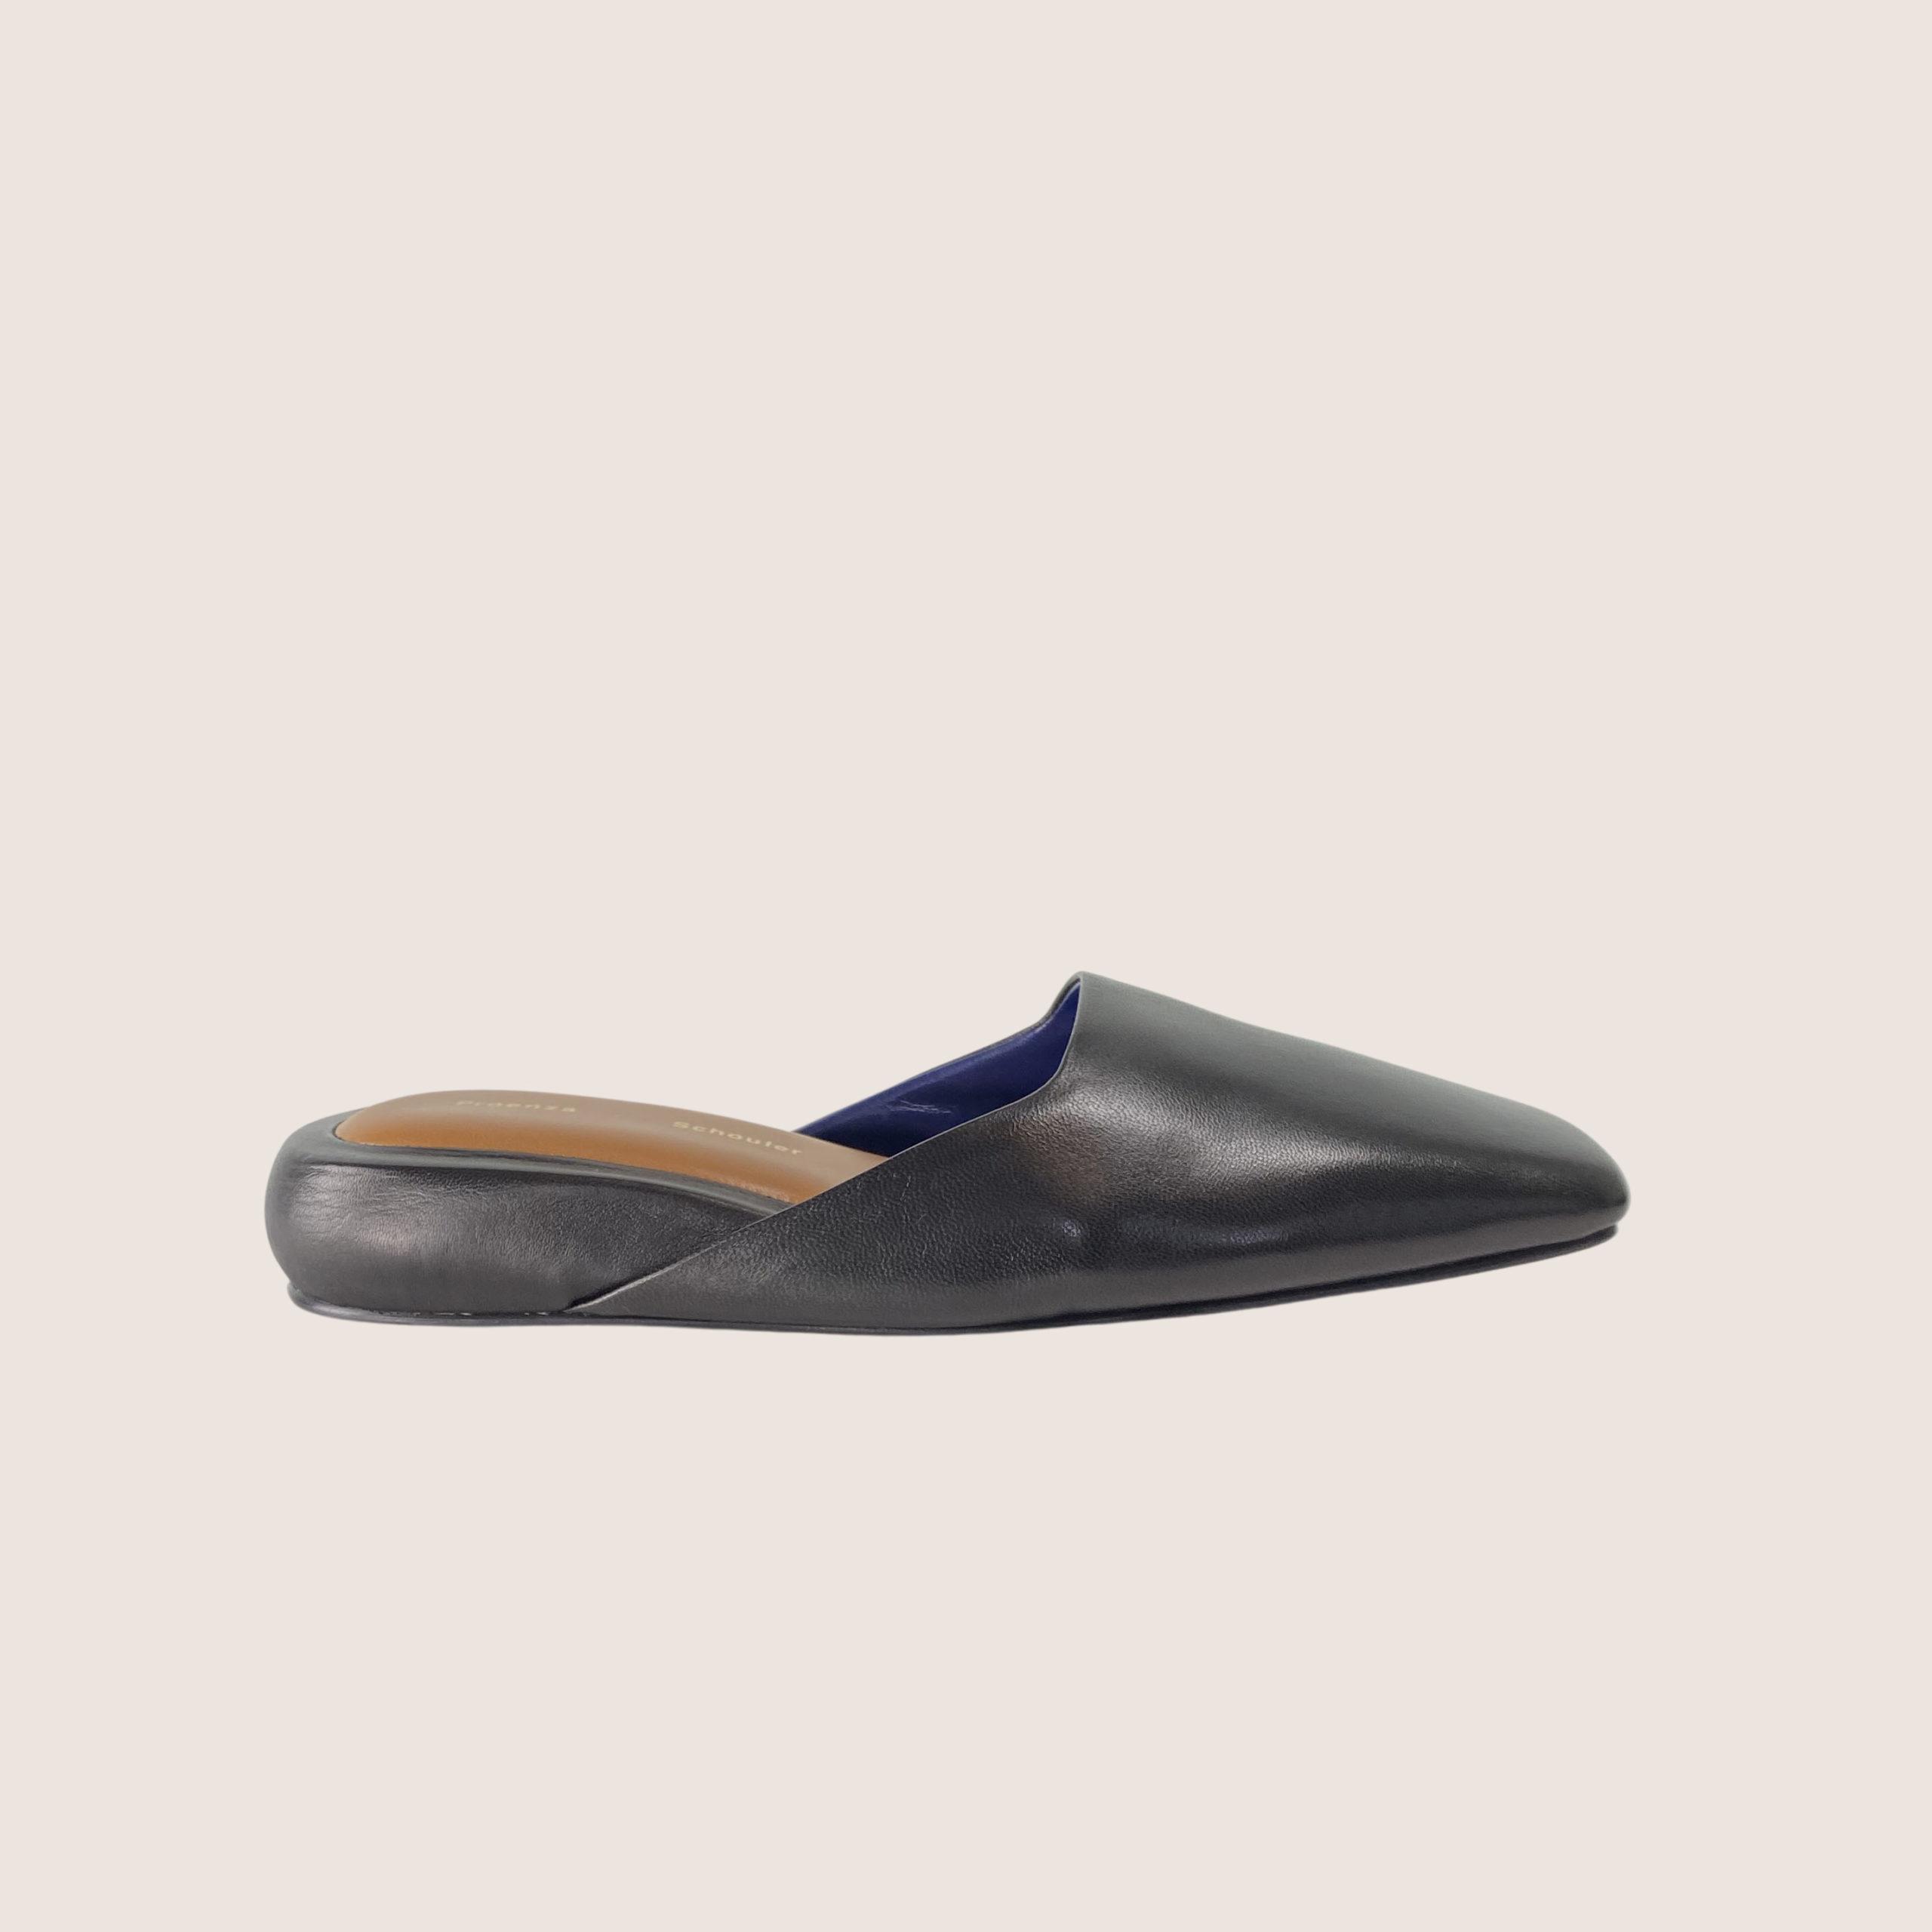 Quad Slippers